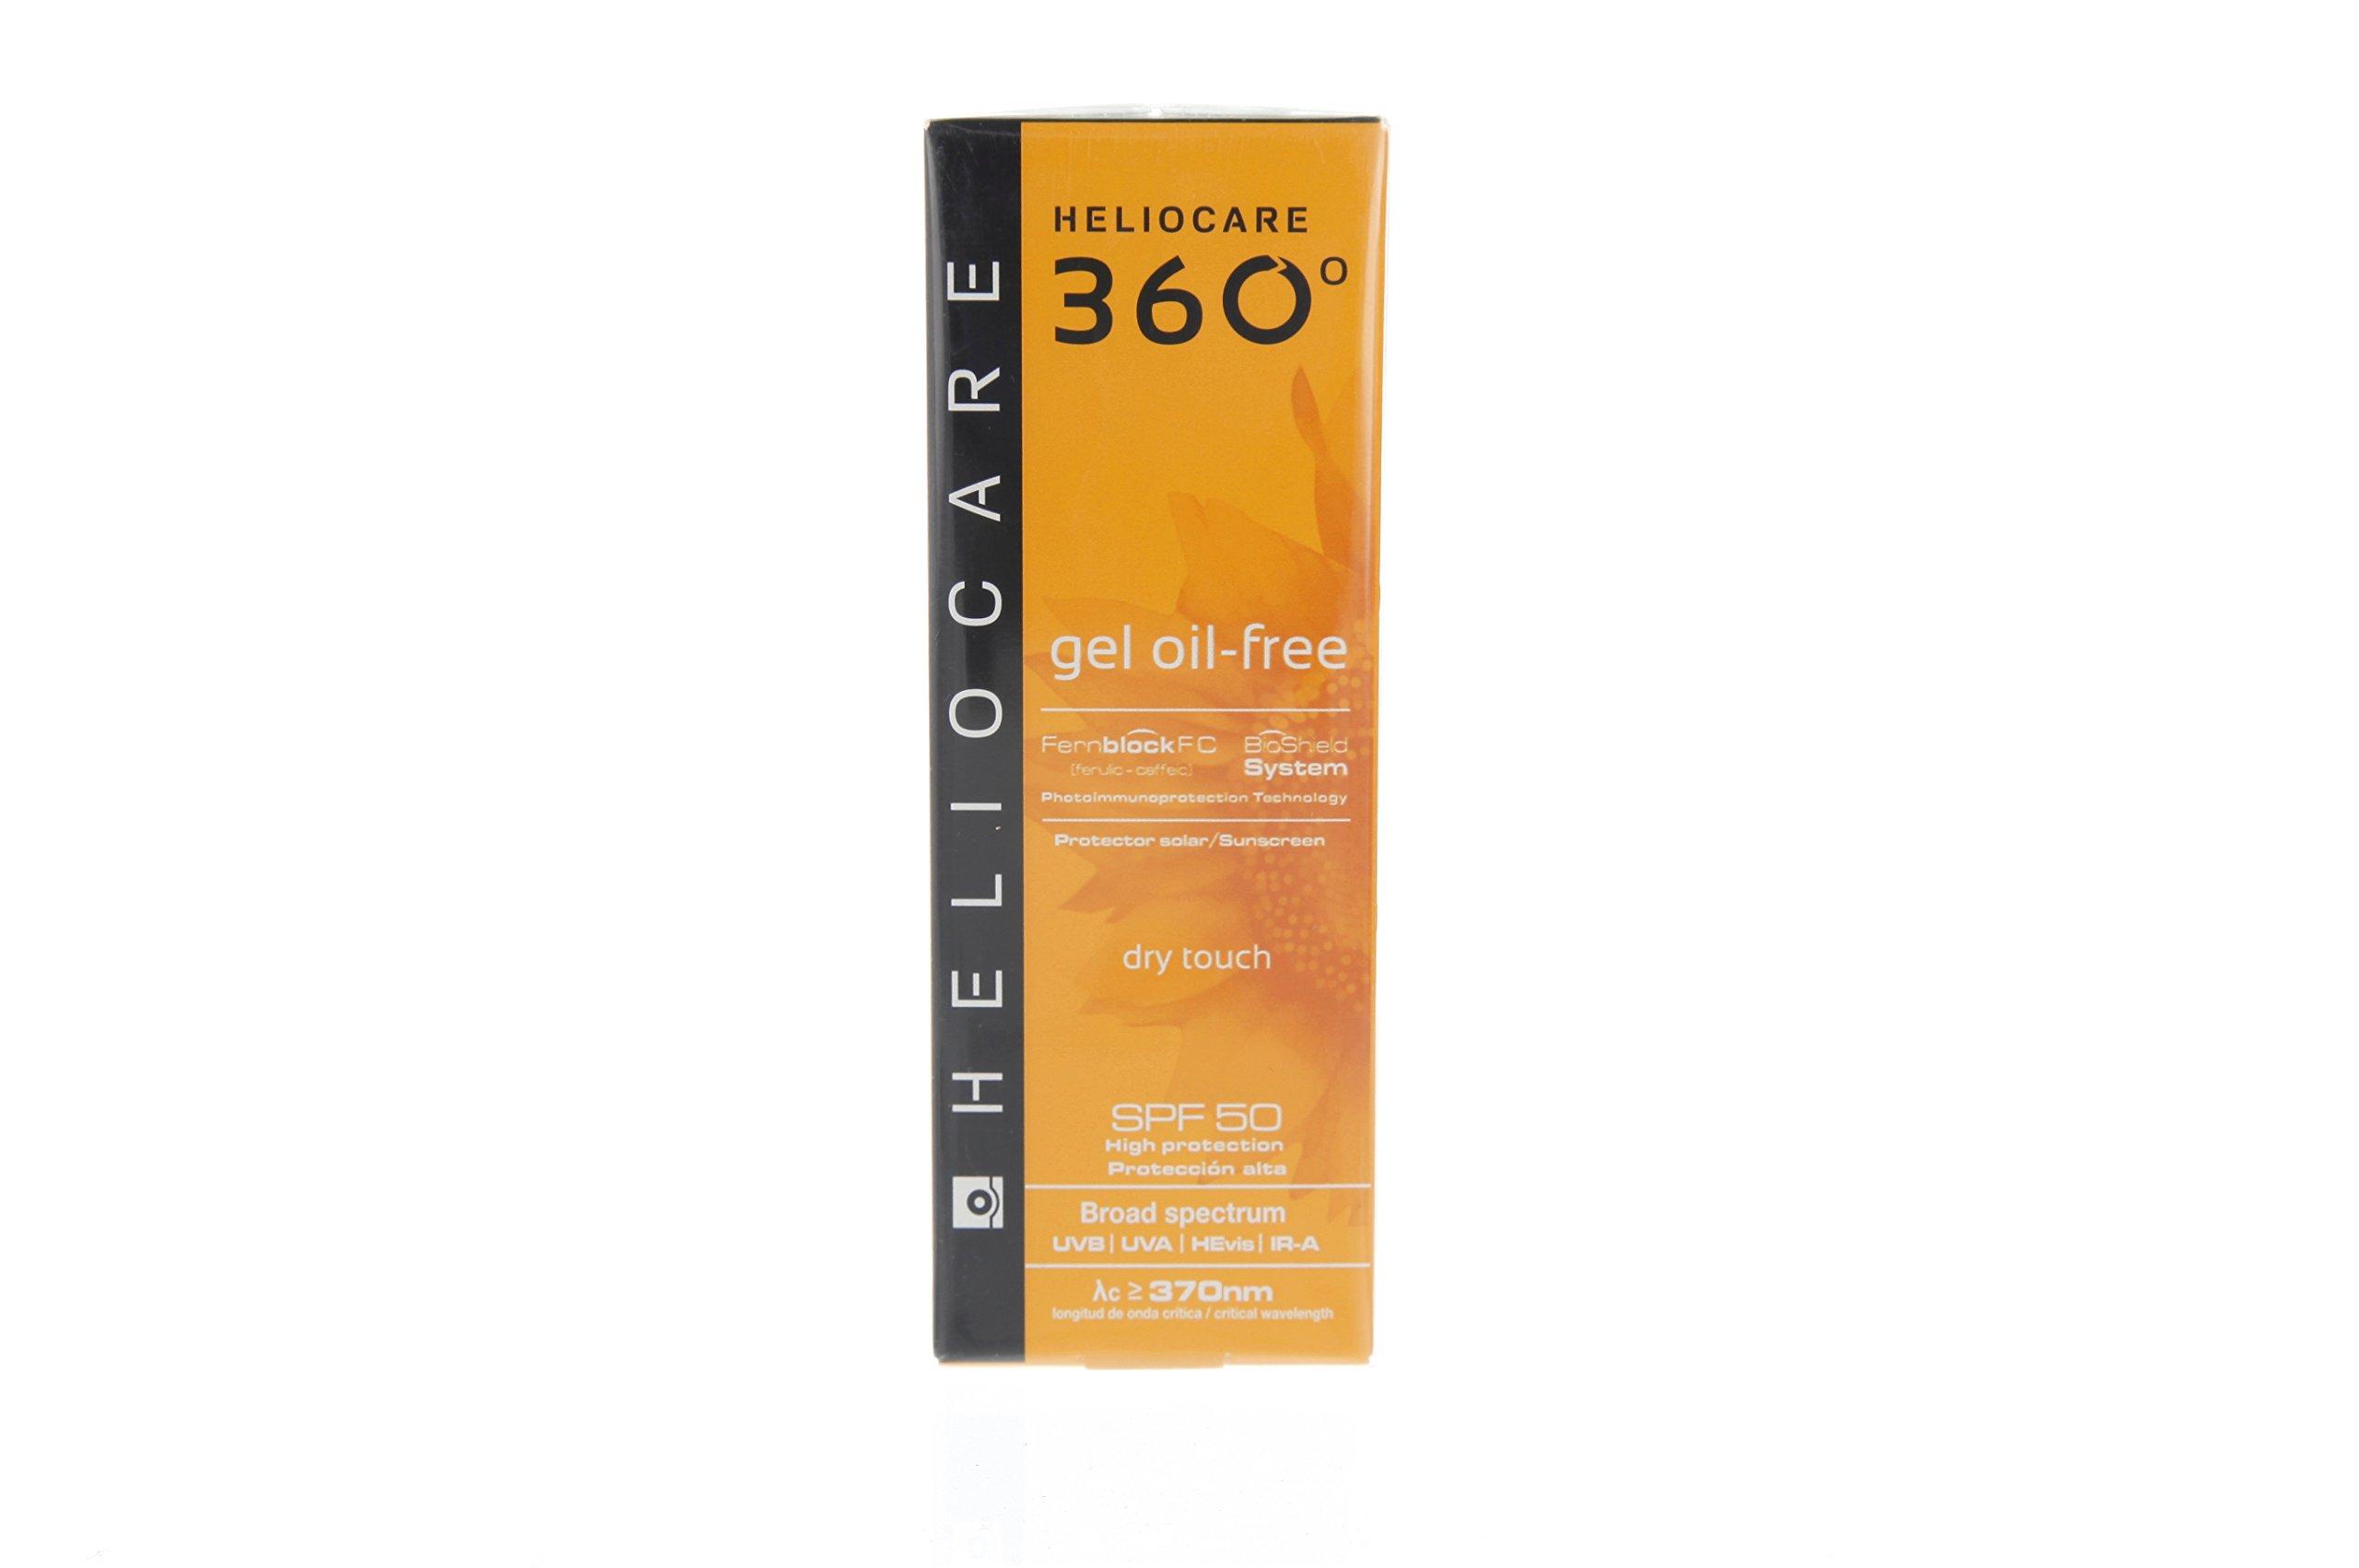 Heliocare 360° Gel Oil-free SPF 50 UVA, UVB Sunscreen 50ml